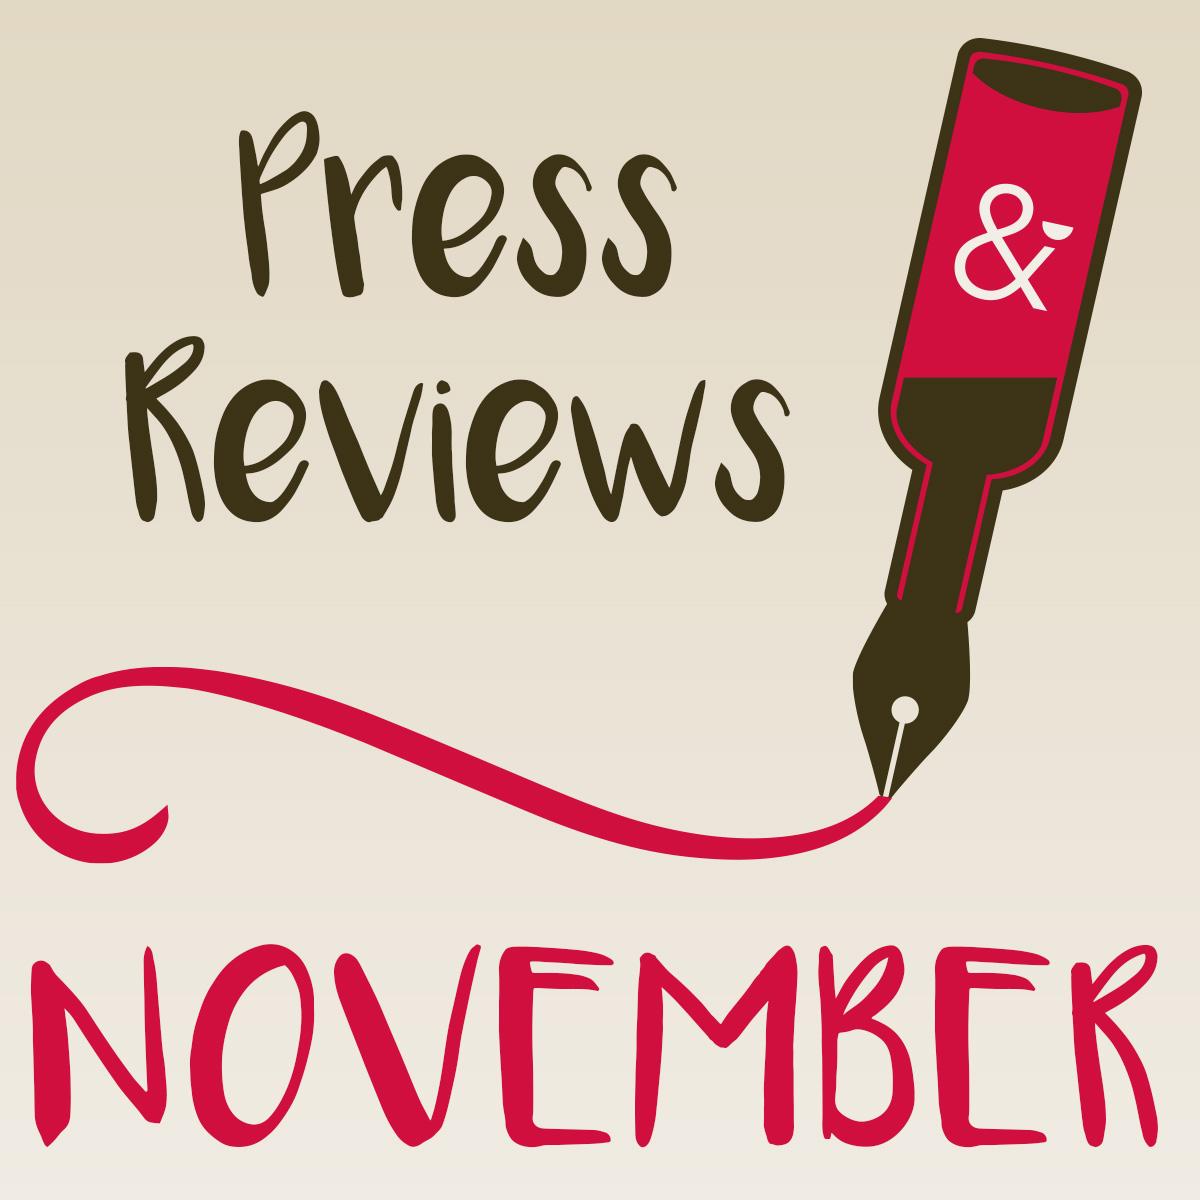 Press Reviews NOVEMBER